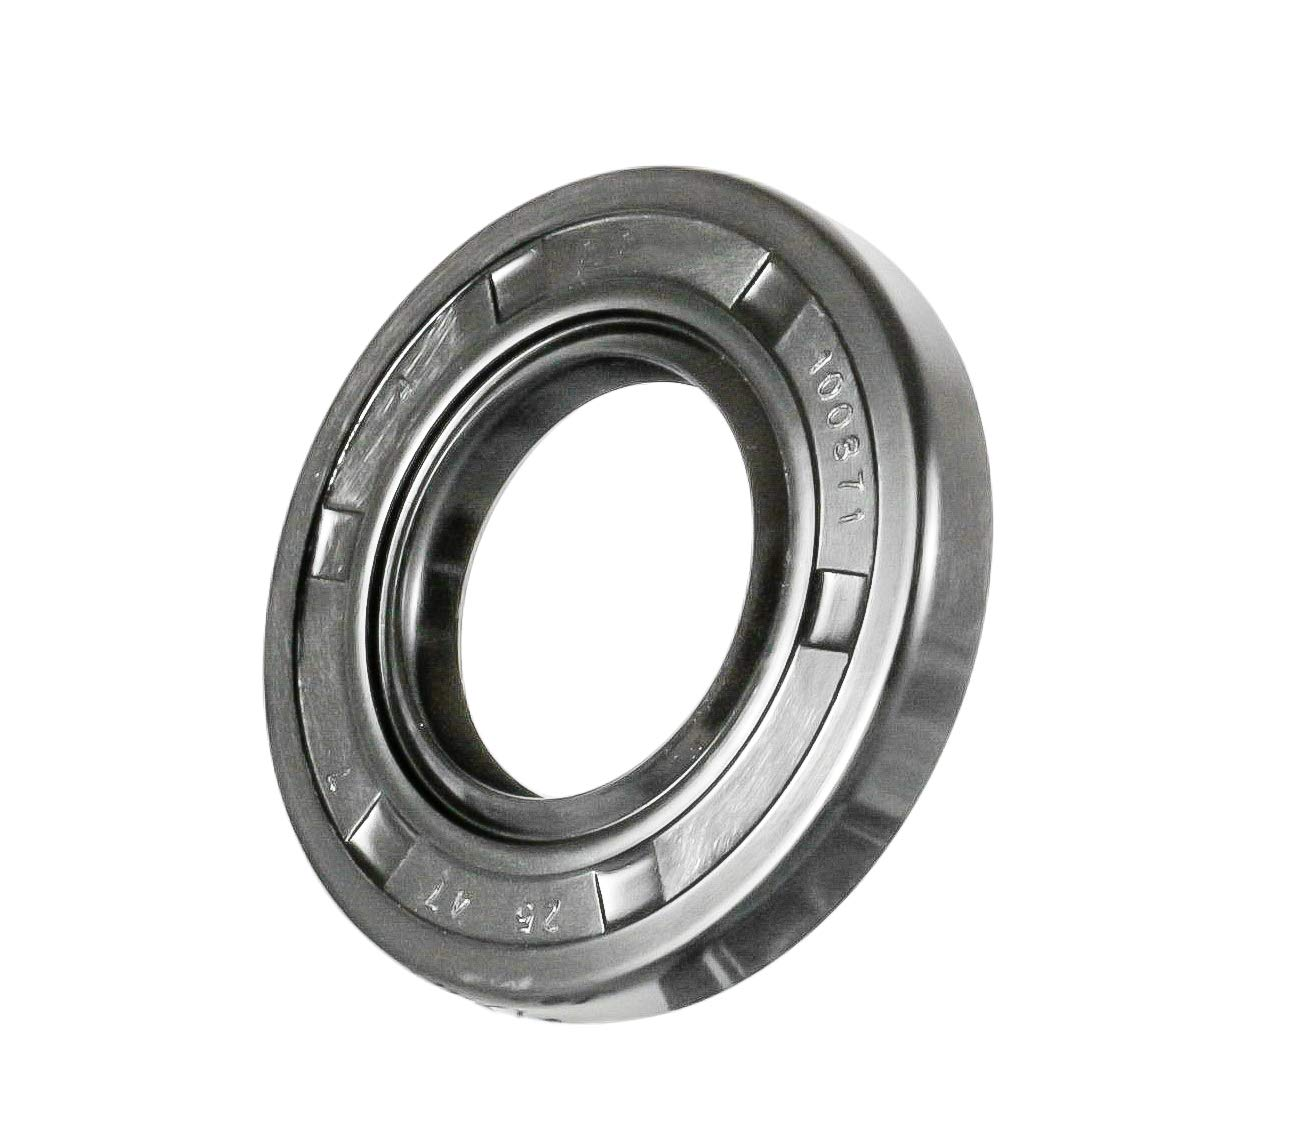 Oil Seal 25X47X7 (10 PCS) Oil Seal Grease Seal TC |EAI Rubber Double Lip w/Garter Spring 25mmX47mmX7mm | 0.984''x1.850''x0.276''